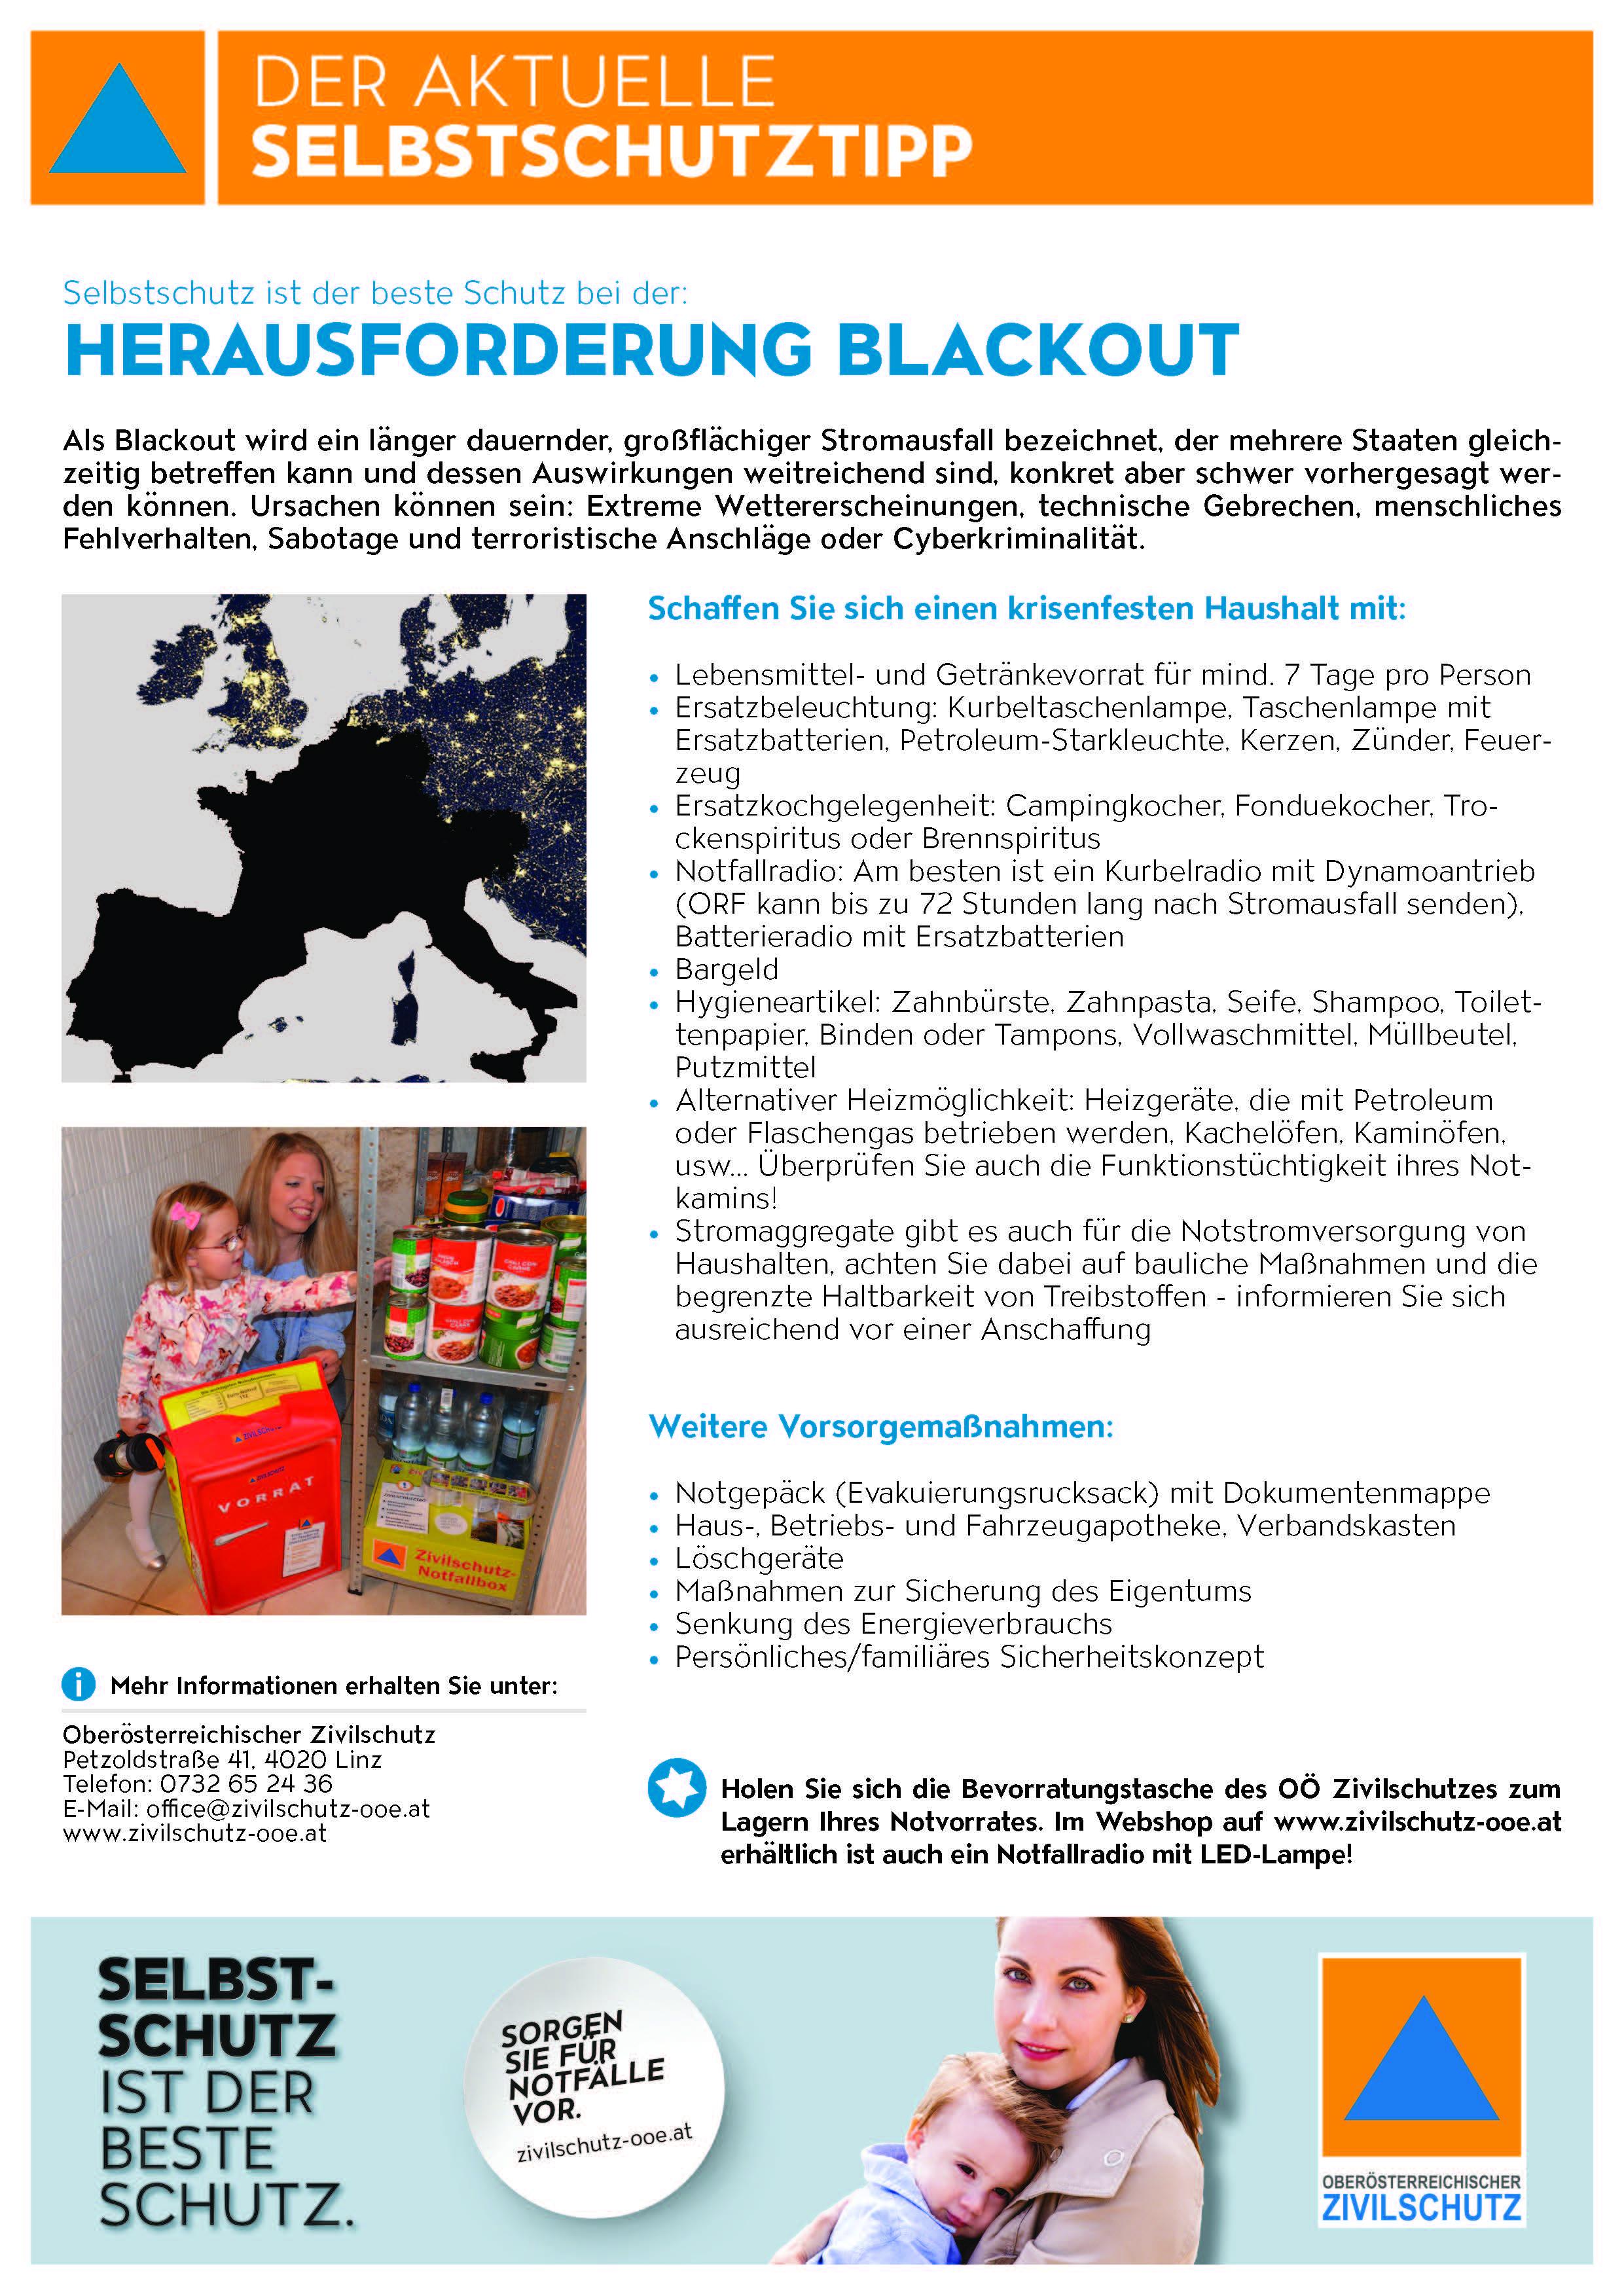 Selbstschutztipp Stromausfall Zivilschutz Oö